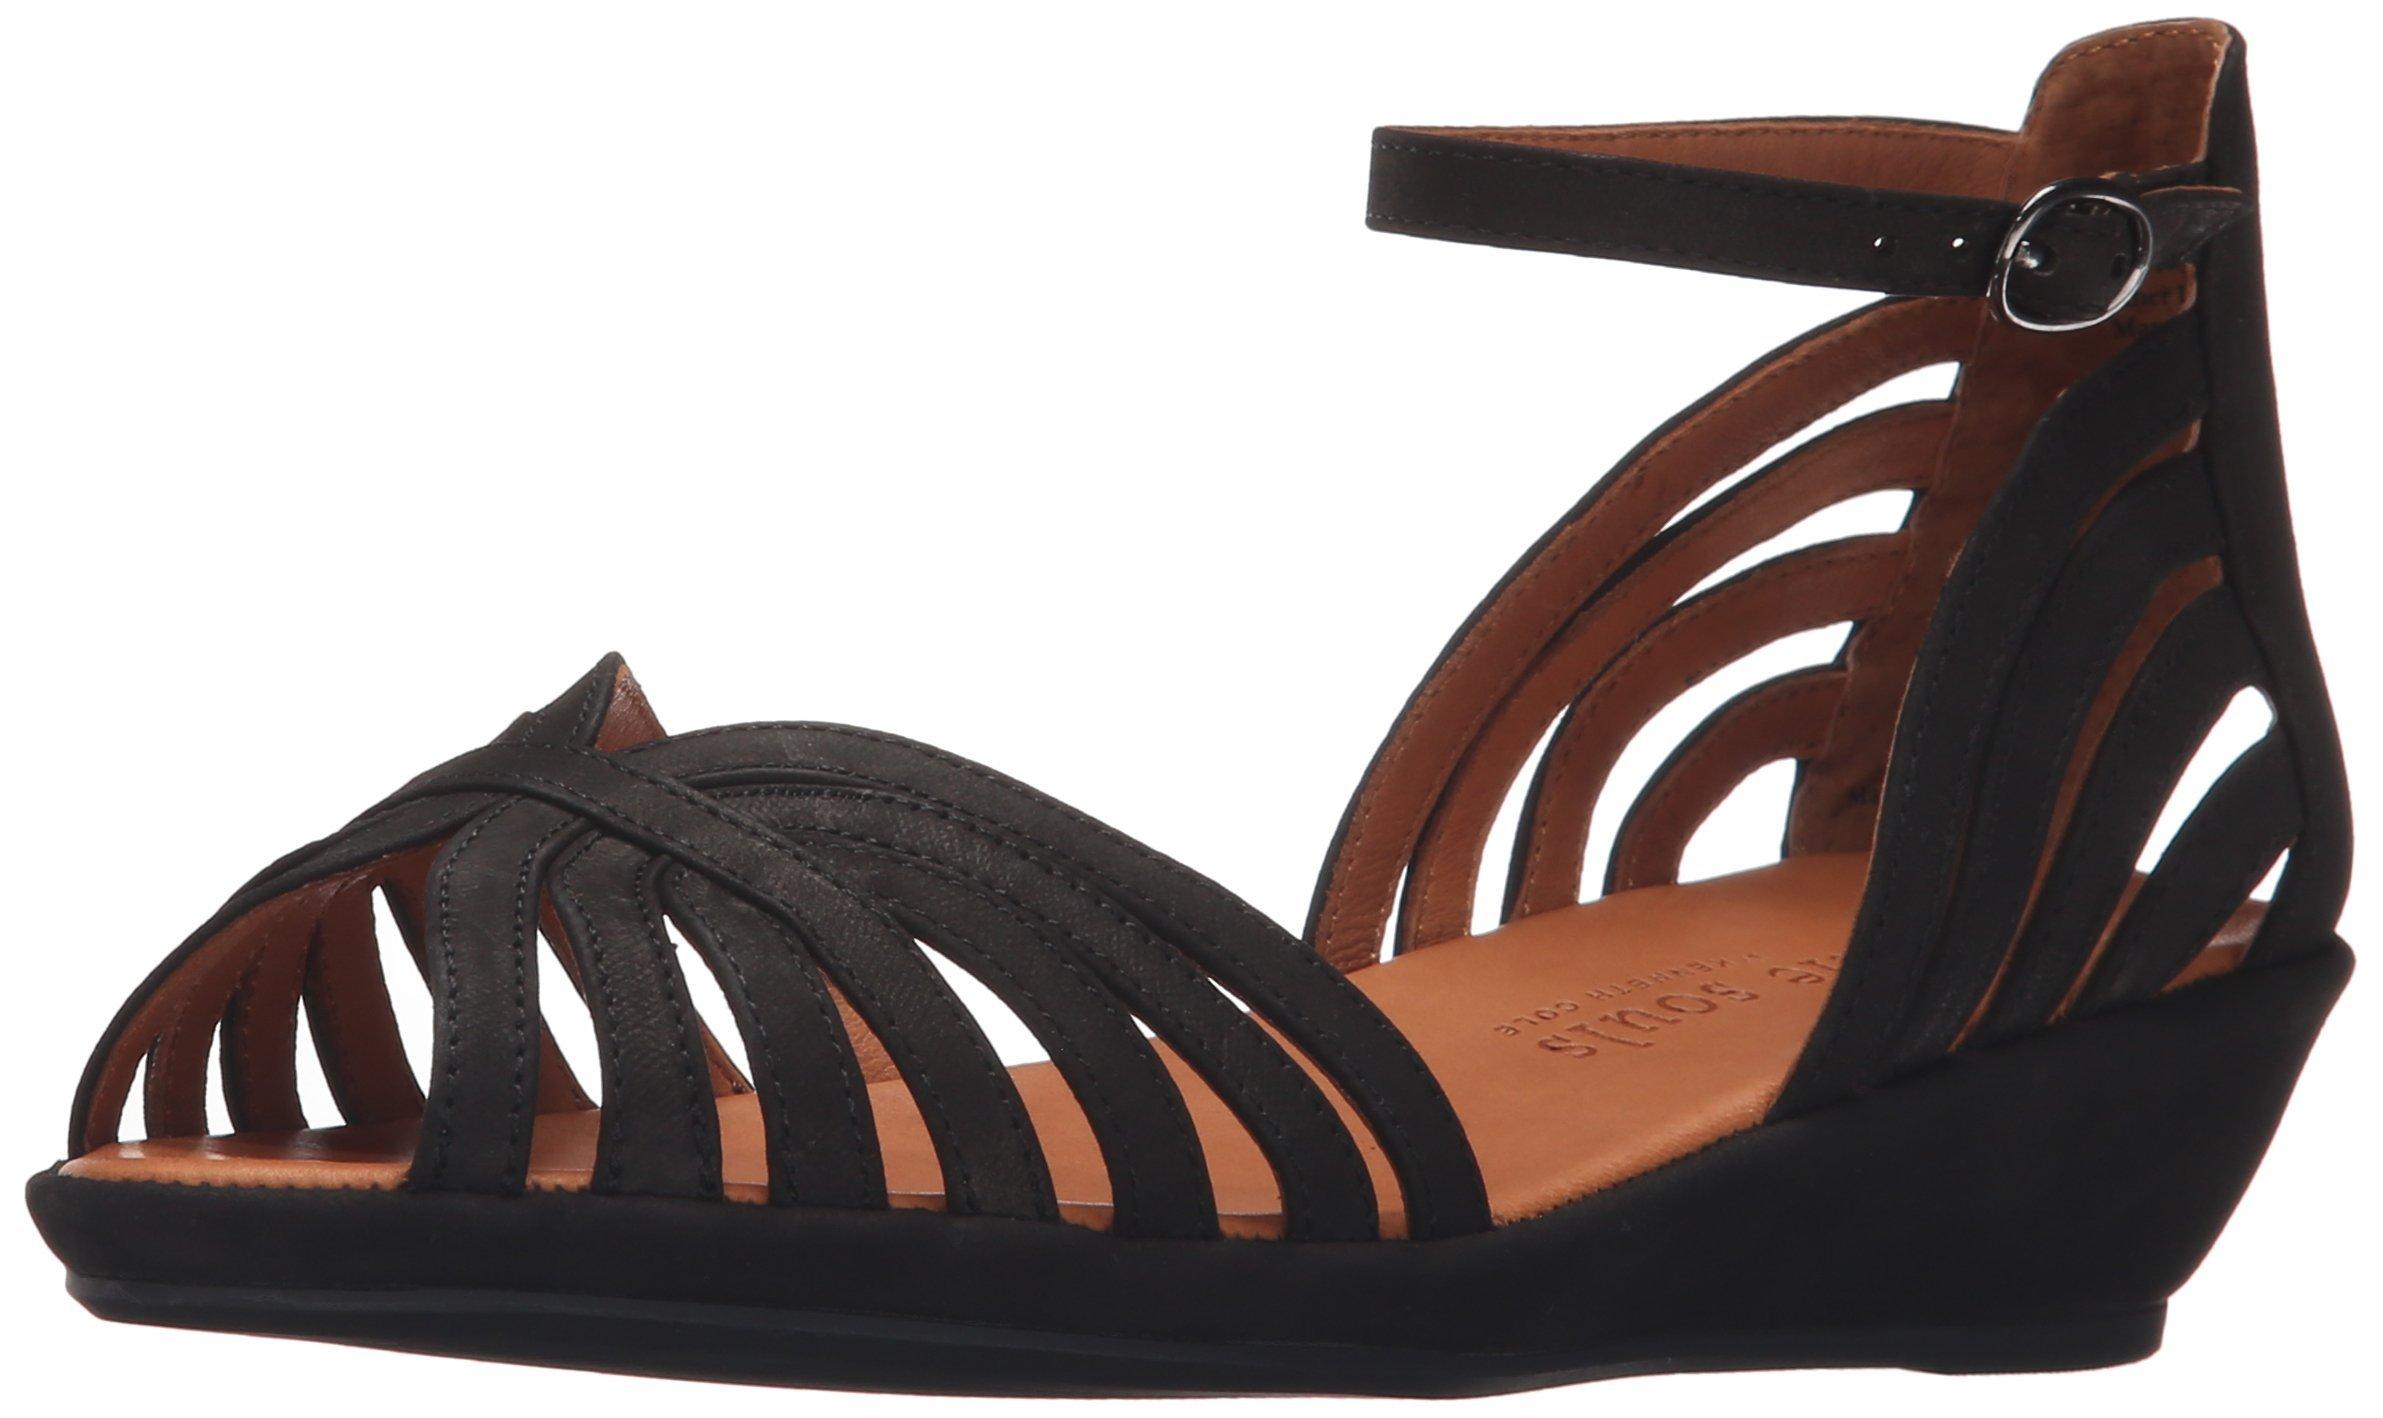 Gentle Souls Women's Leah Wedge Sandal, Black/Nubuck, 8 M US